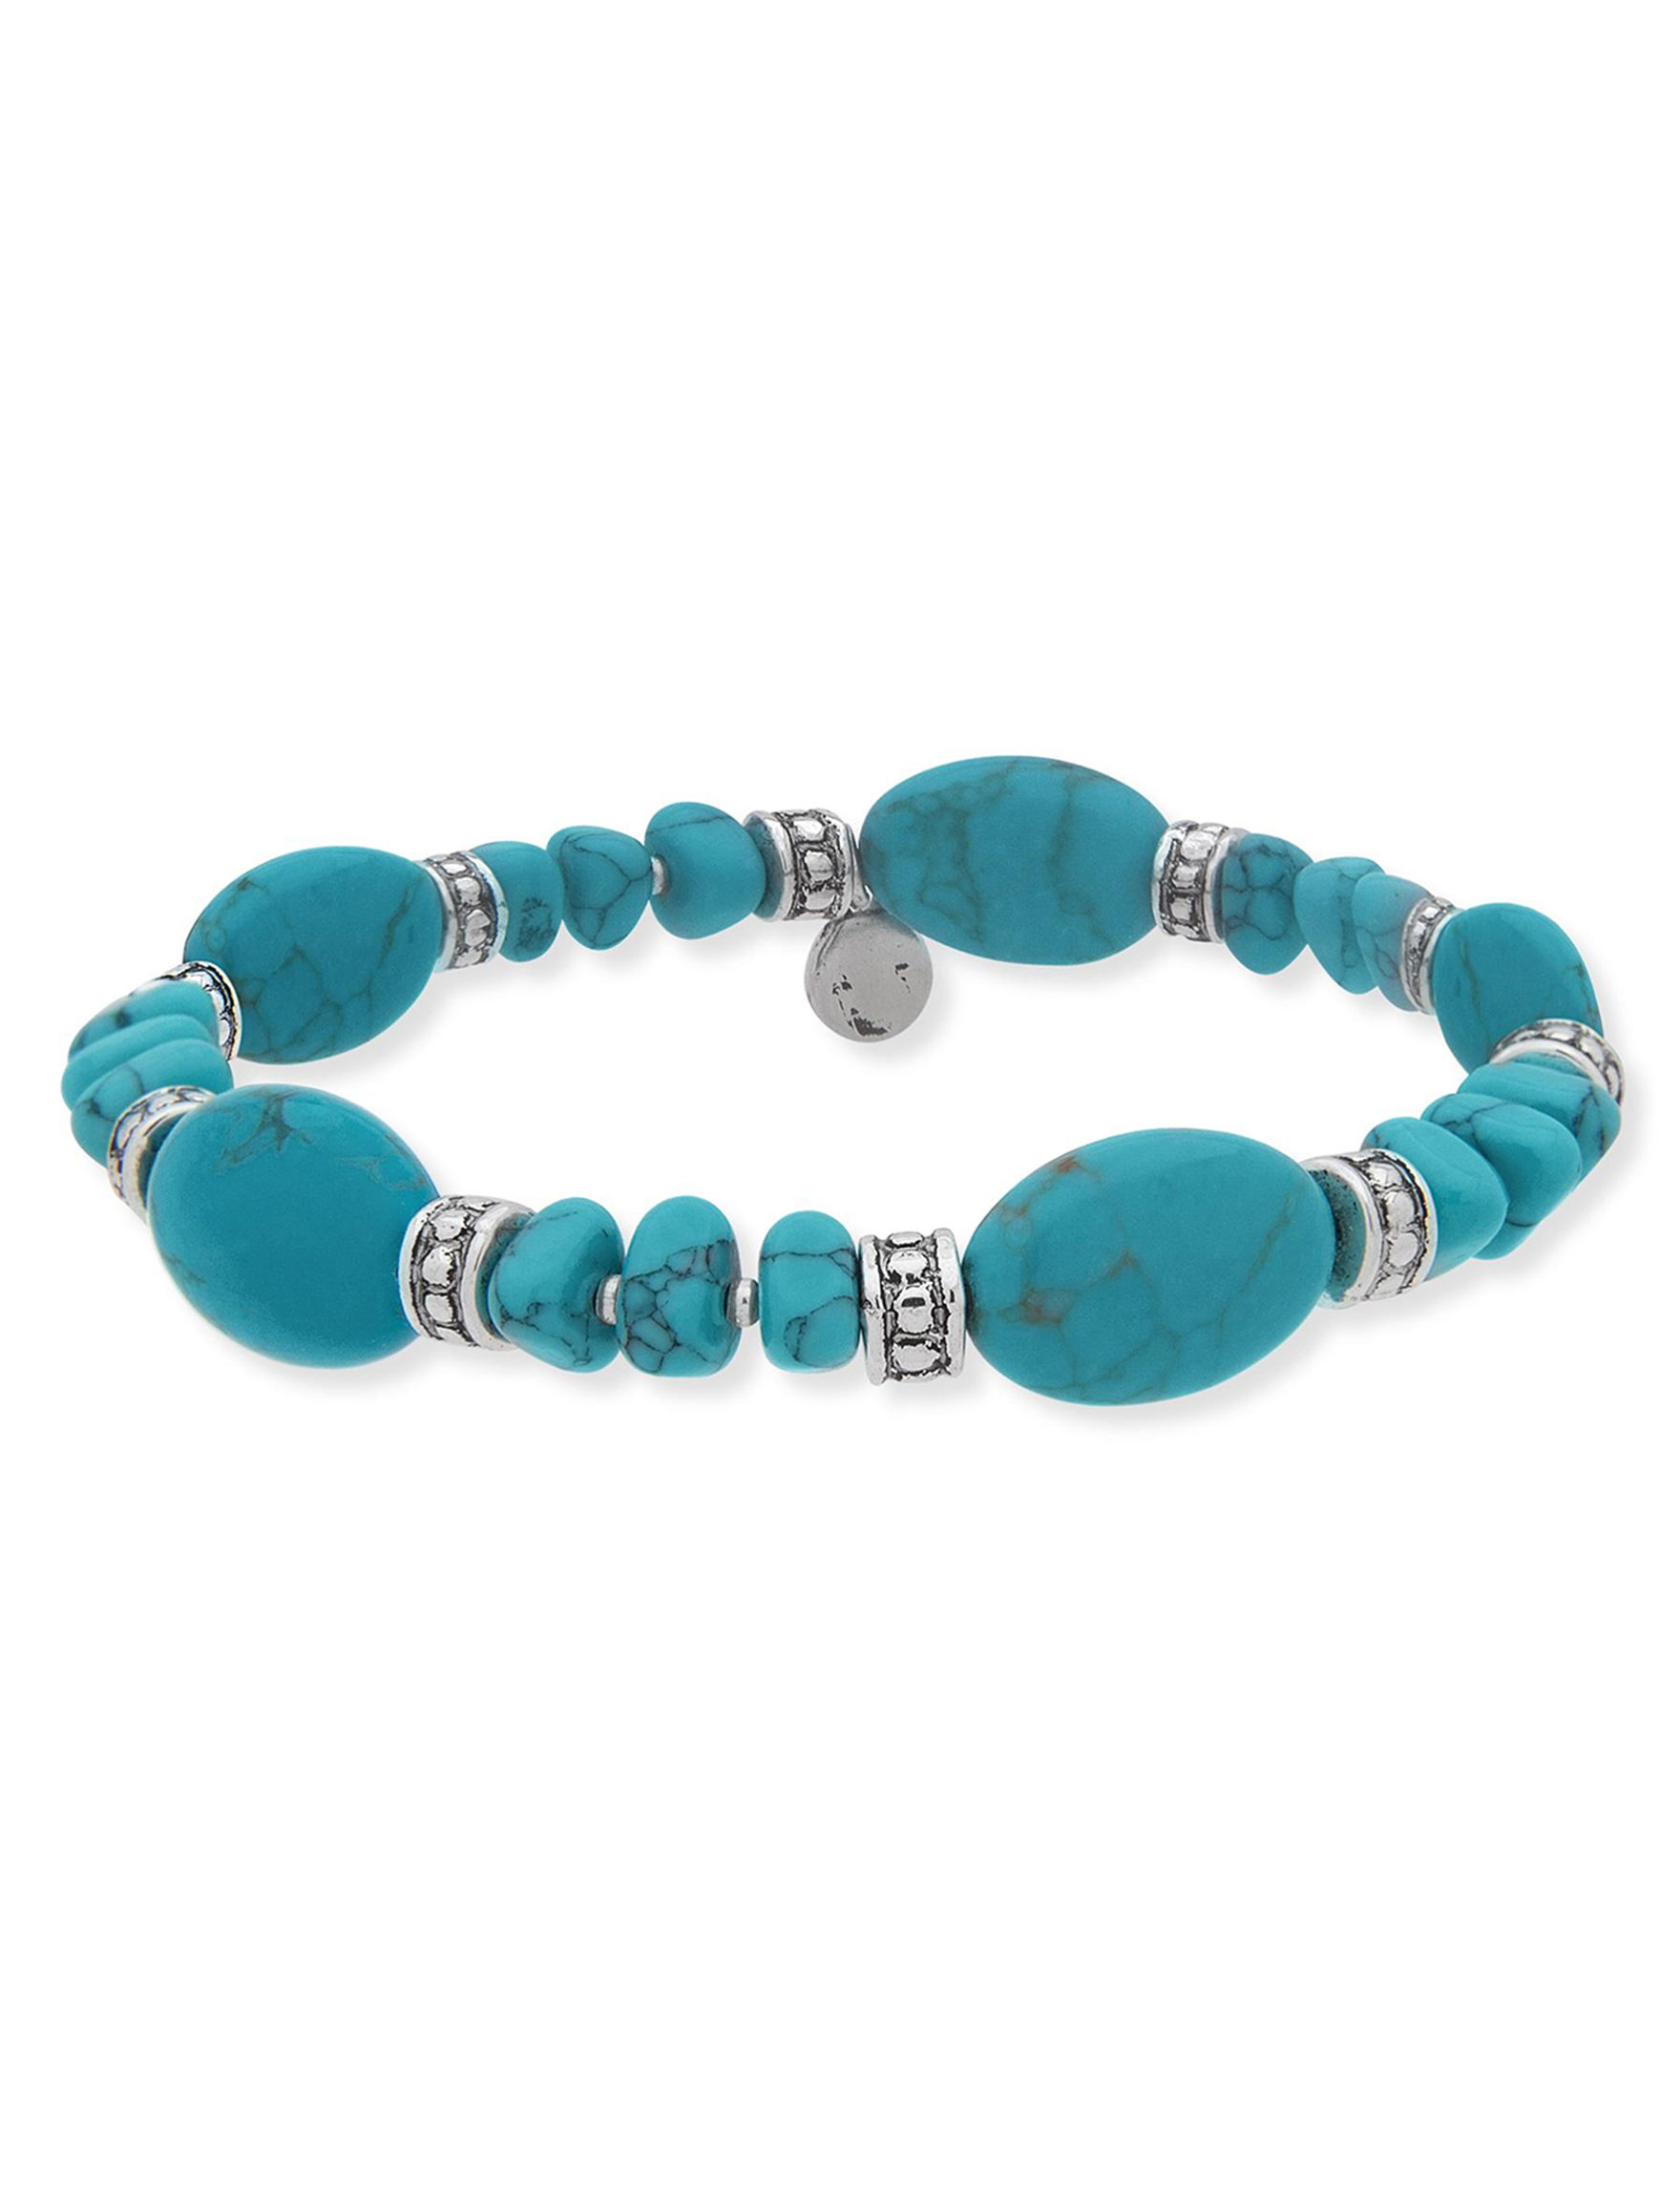 Chaps Turquoise Bracelets Fashion Jewelry